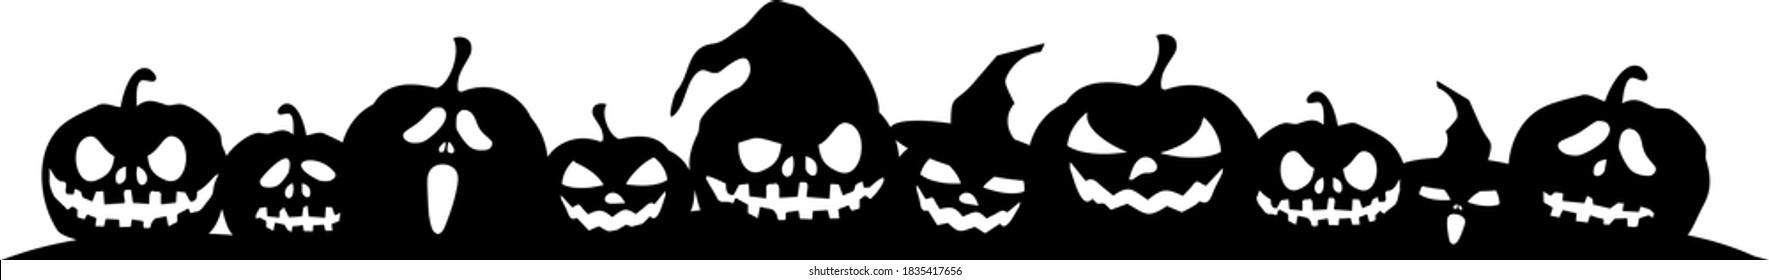 HALLOWEEN PUMPKIN Horror Holiday Silhouette Vector